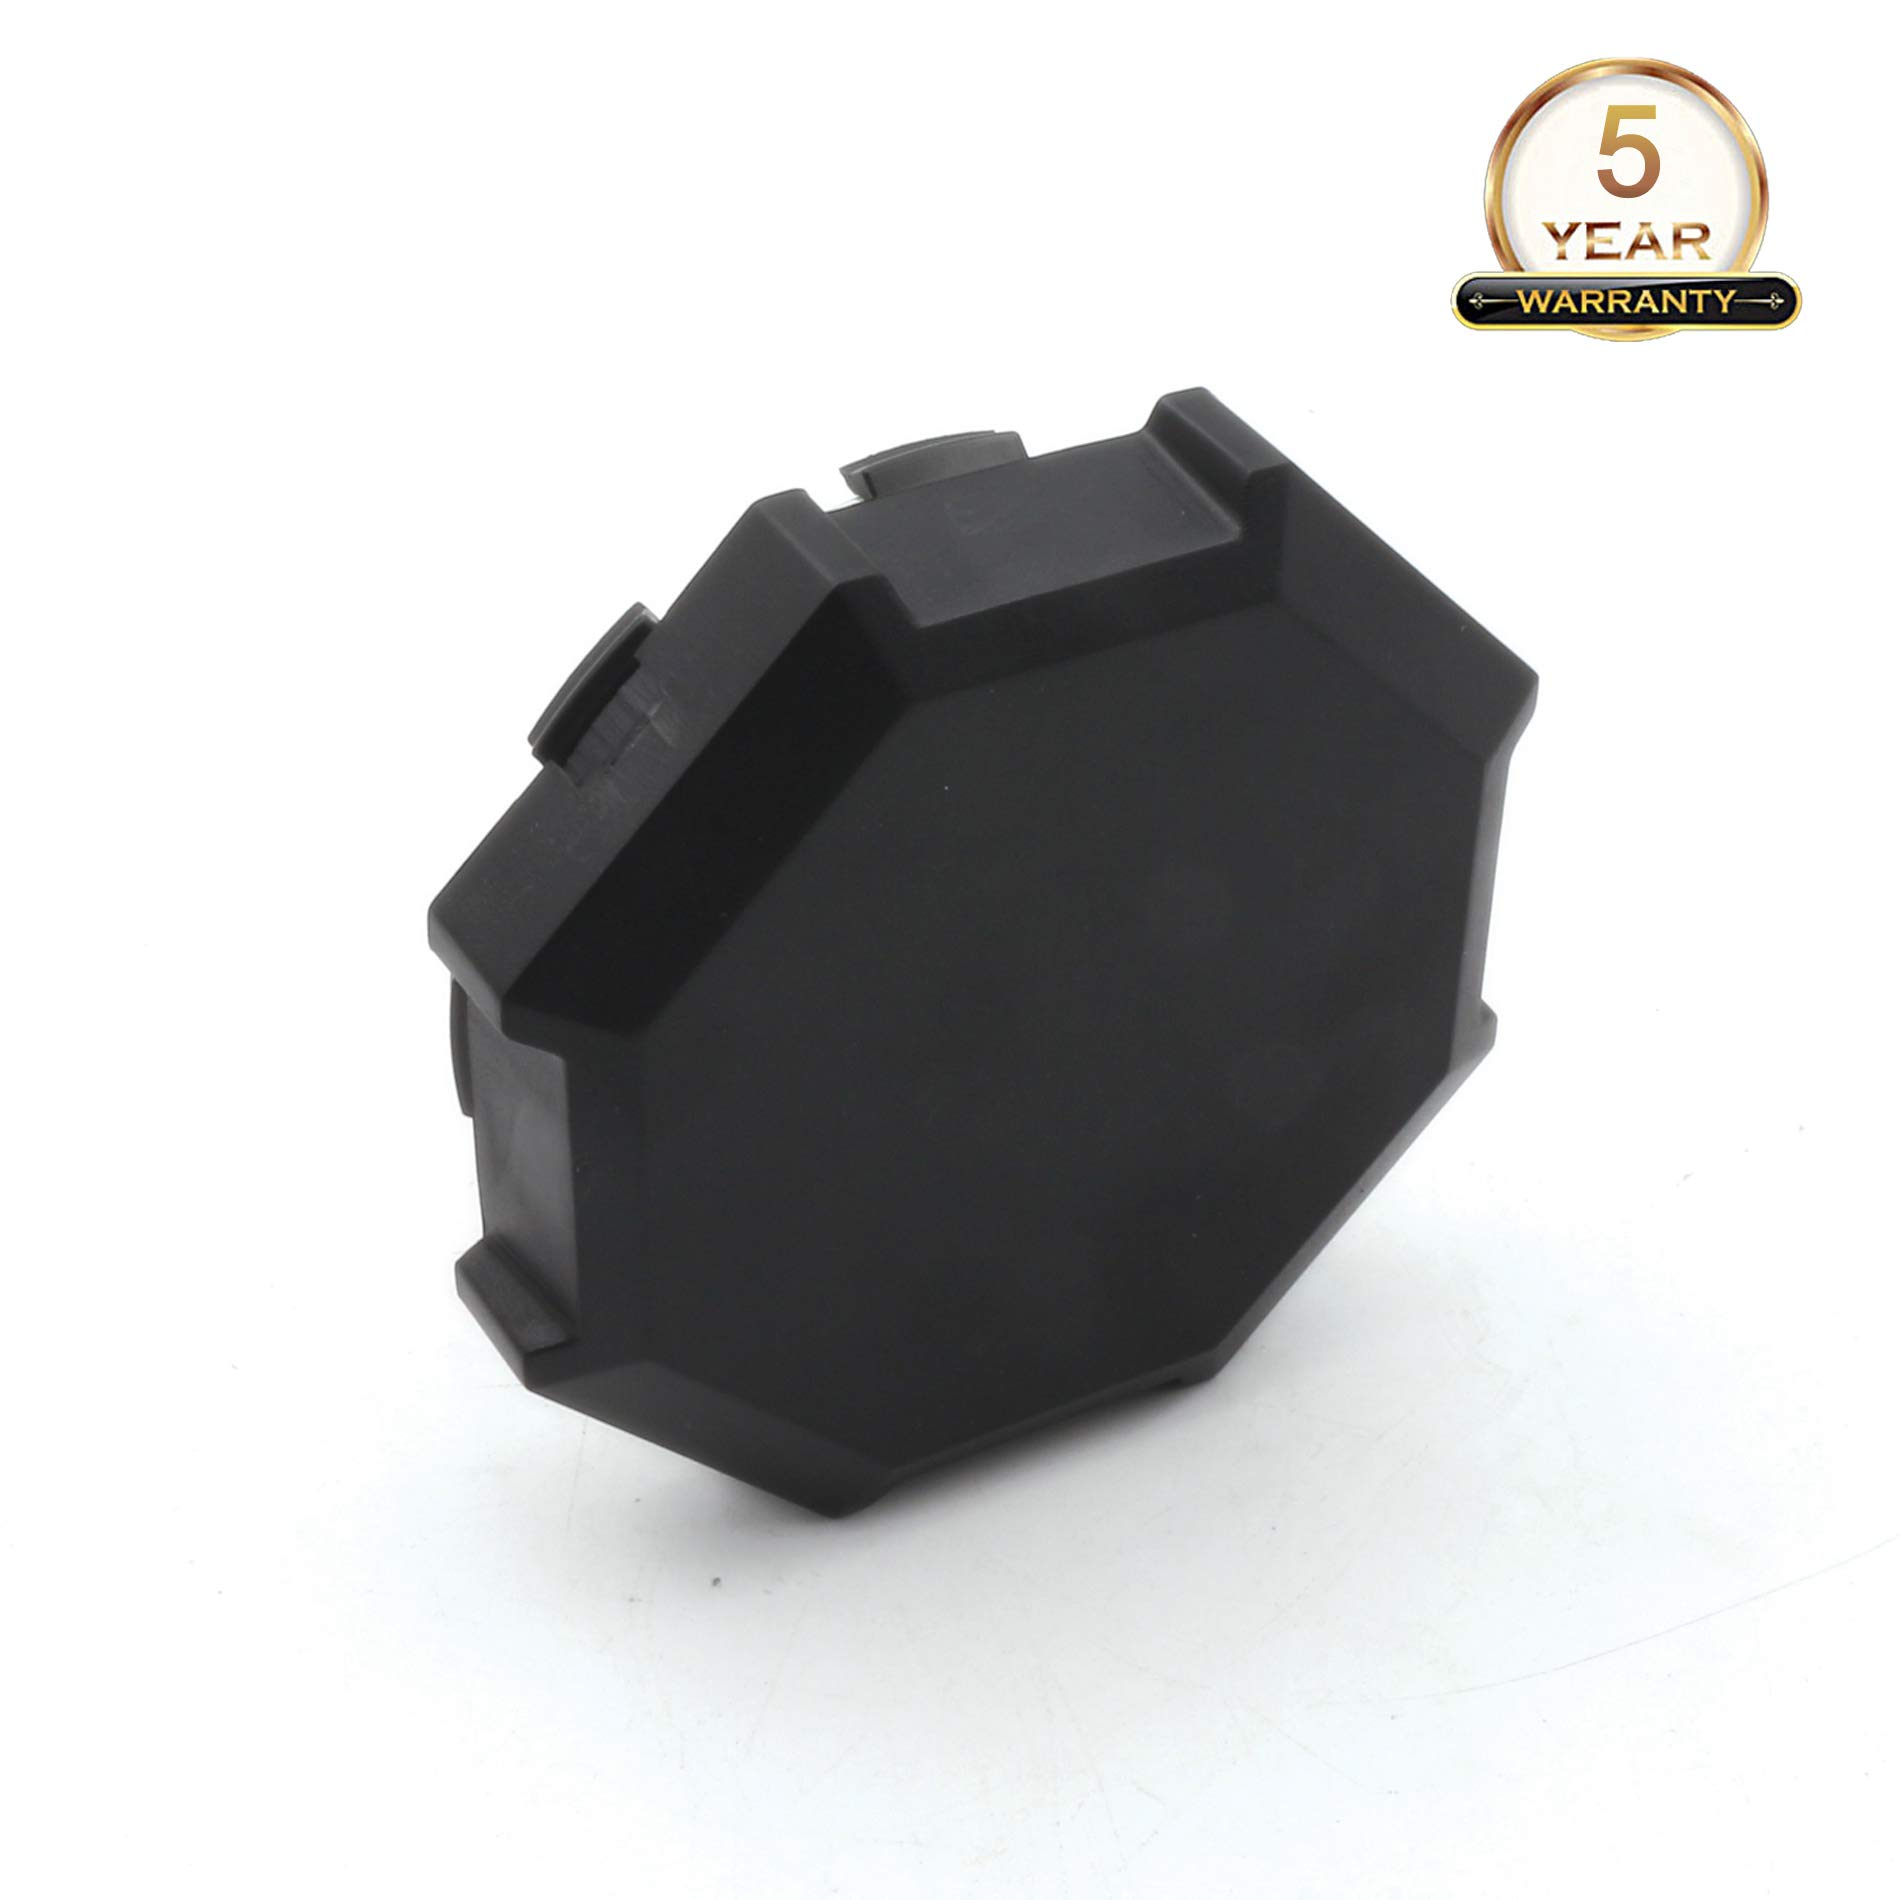 CPOWACE Black Hub Caps Wheel Center Caps For Polaris RZR 900 100 XP 4 1522216-655 (1pc)